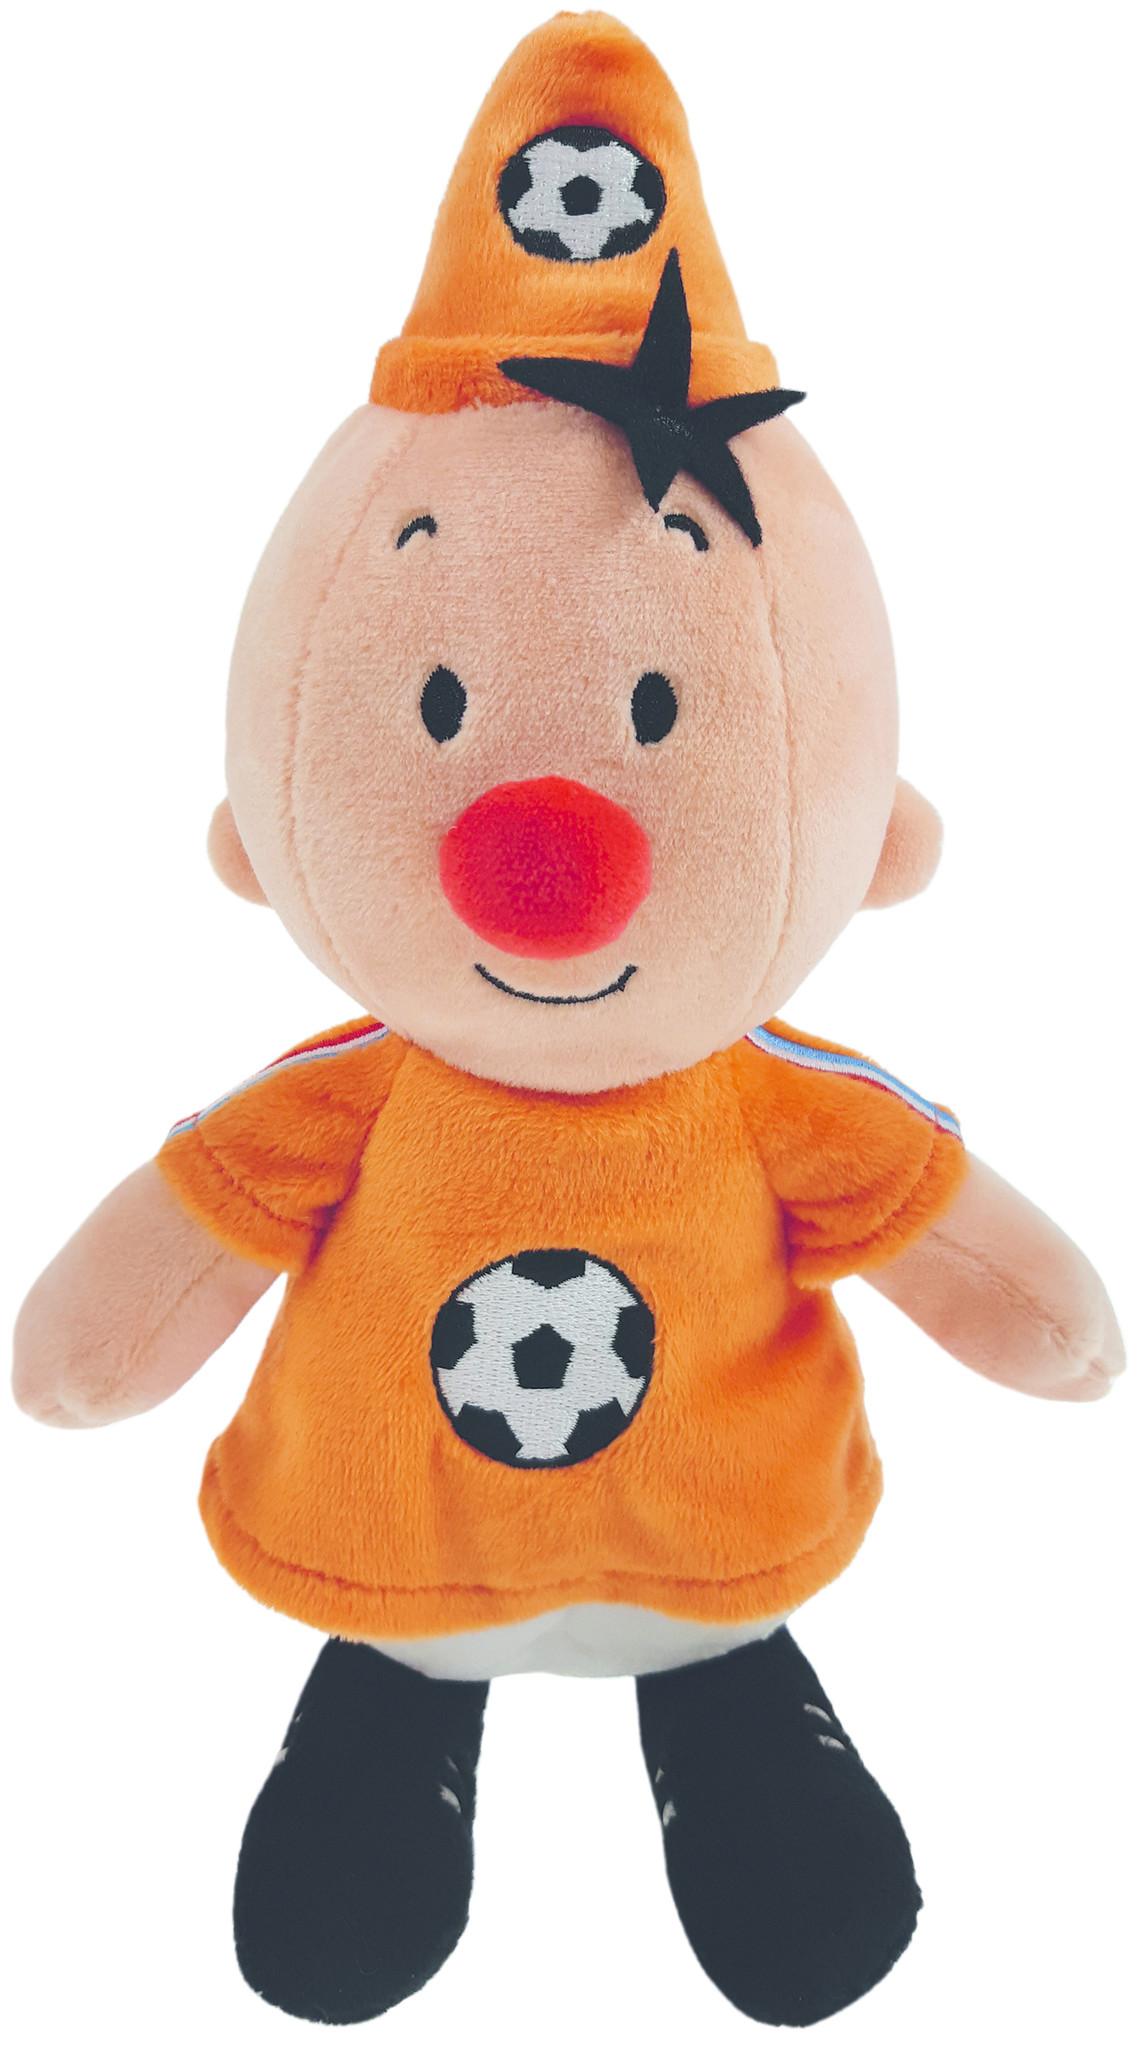 Bumba plush: Soccer player Holland 20 cm